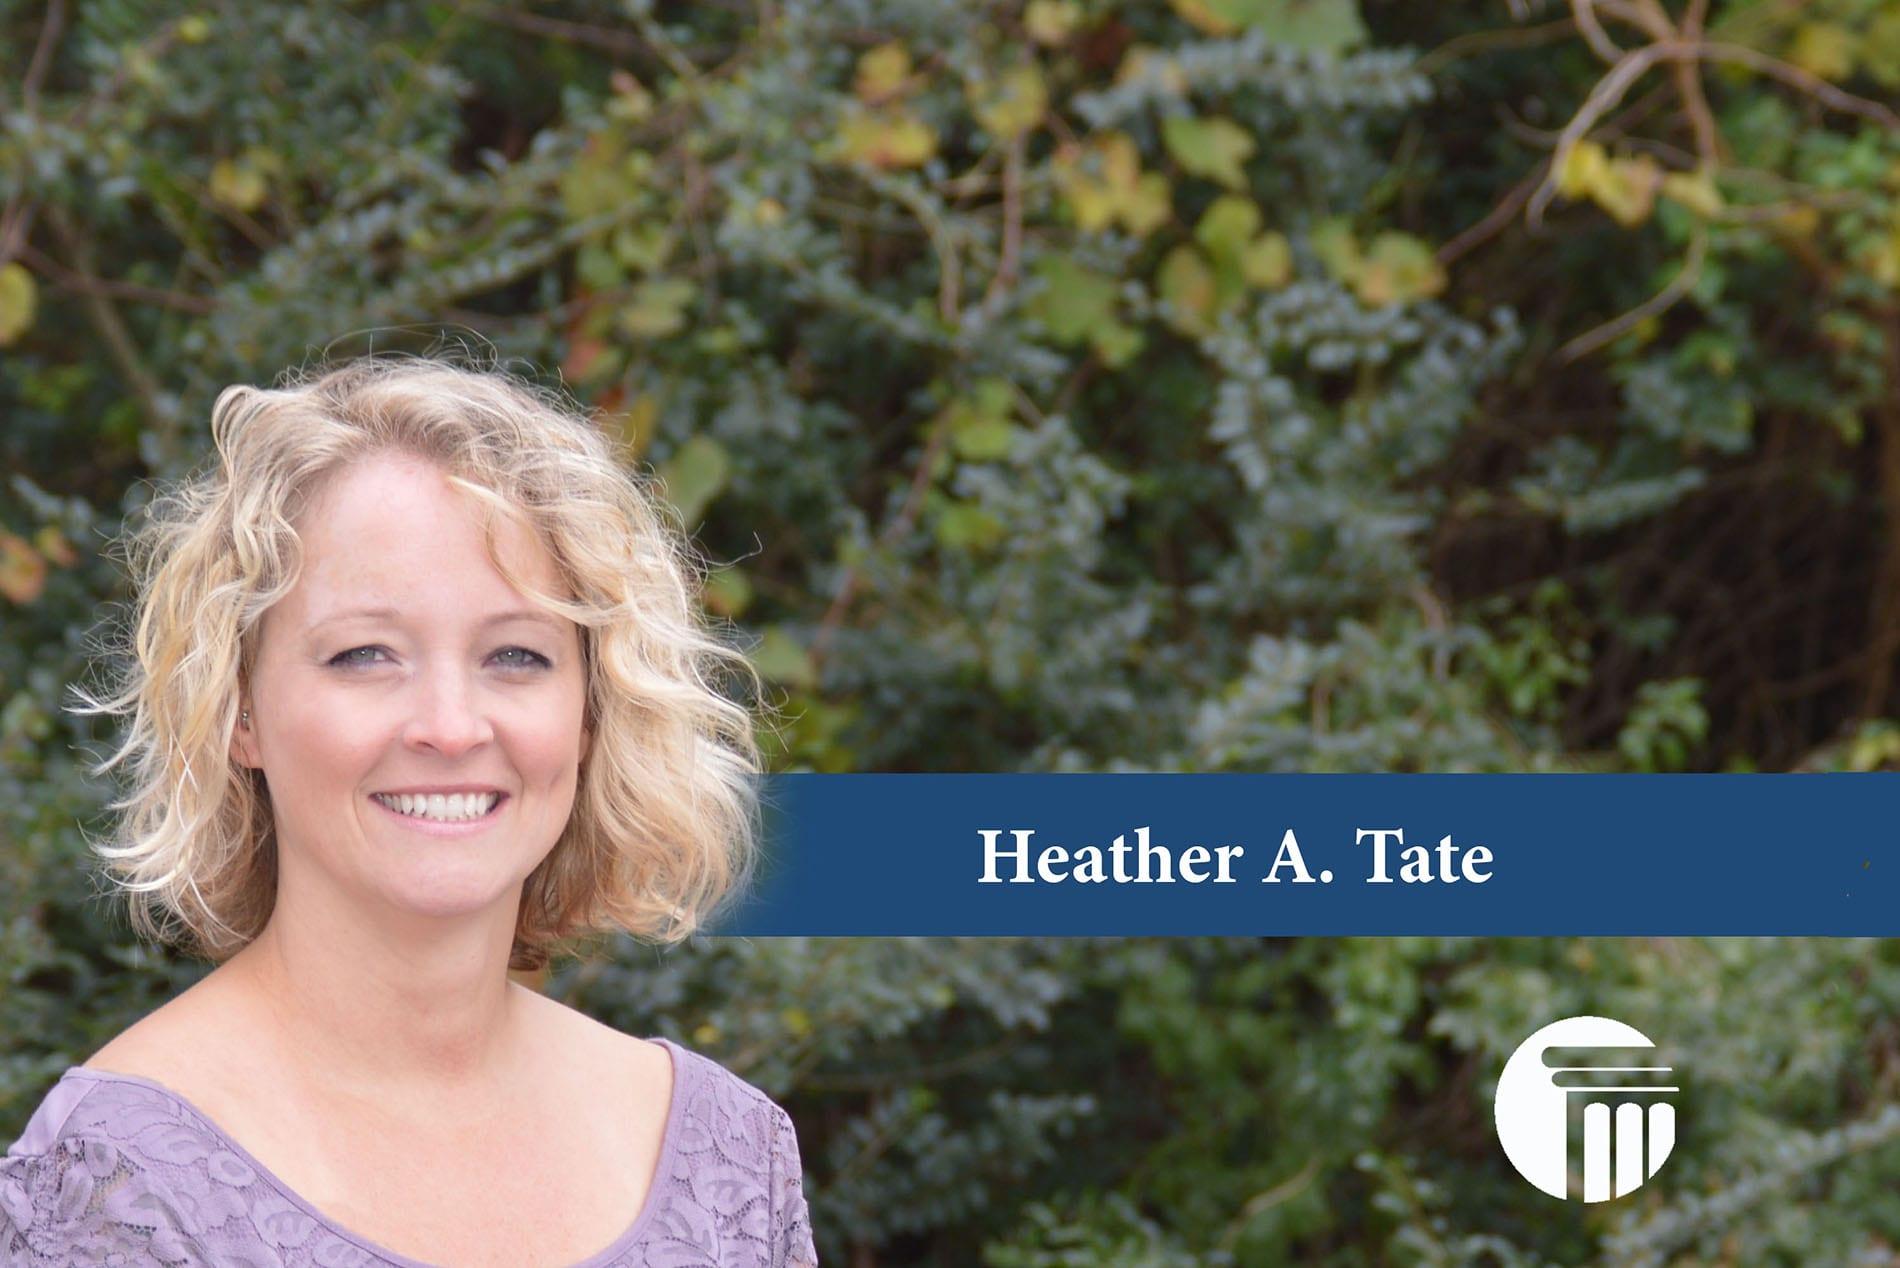 Heather A. Tate - Chapter 7 Paralegal - Virginia Beach, Chesapeake, Portsmouth,Henrico, Newport News, Hampton